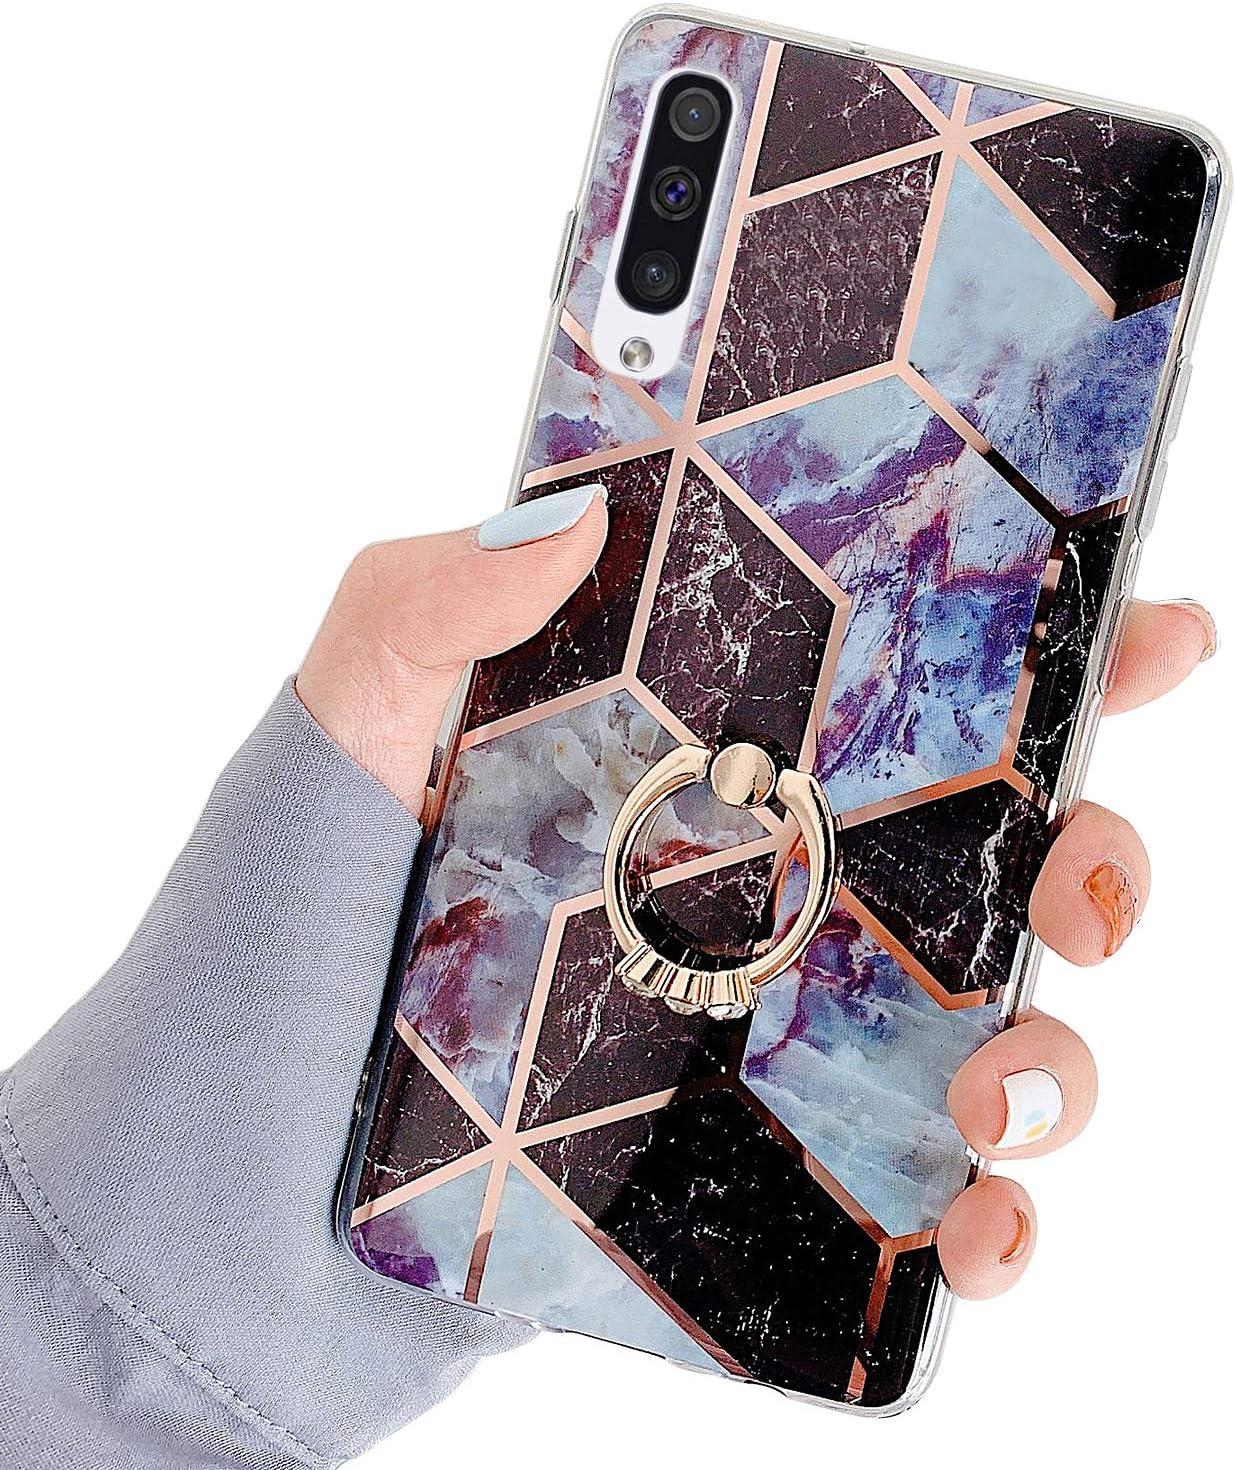 Robinsoni Funda Compatible con Samsung Galaxy A70 Funda Silicona Funda con Anillo Vistoso M/ármol Espejo Funda Brillar Caso Soporte de Anillo con Brillo Carcasa Flexible Ultra Delgado Funda Azul